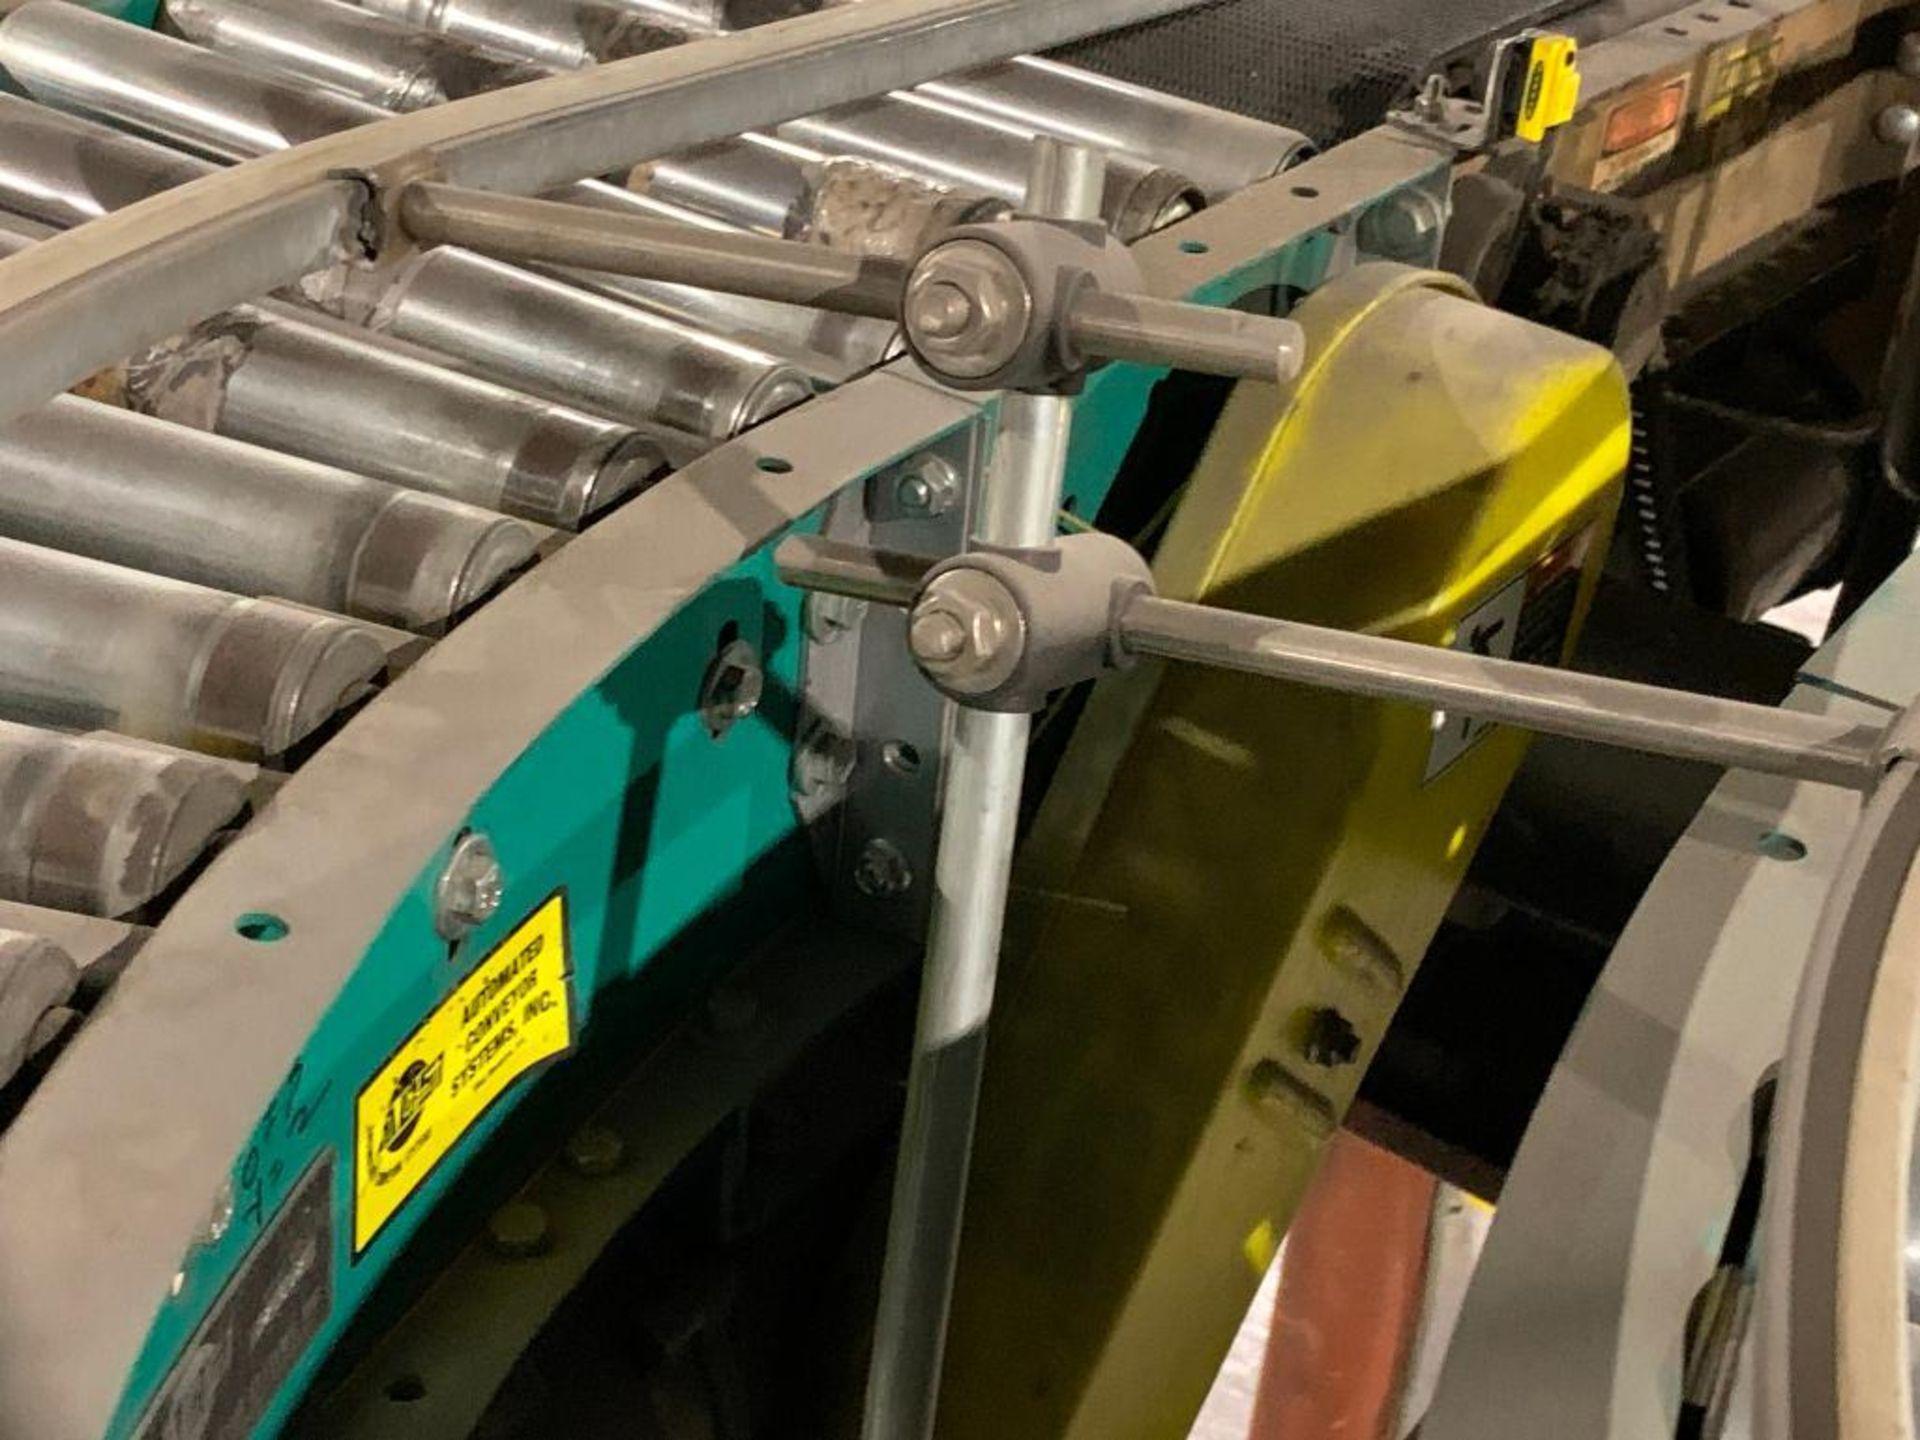 ACS power roller conveyor - Image 9 of 15